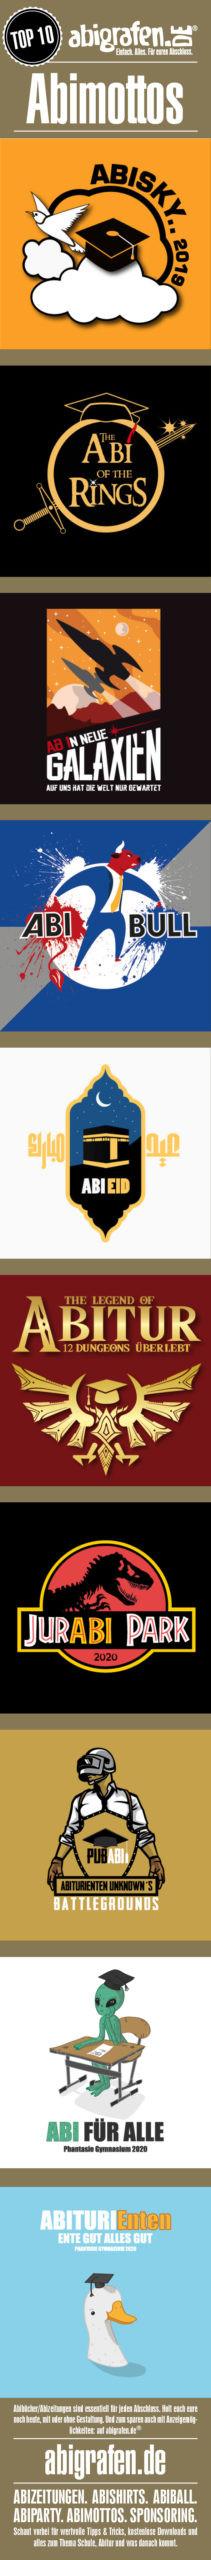 abimotto-motive-druck-prdukte-alles